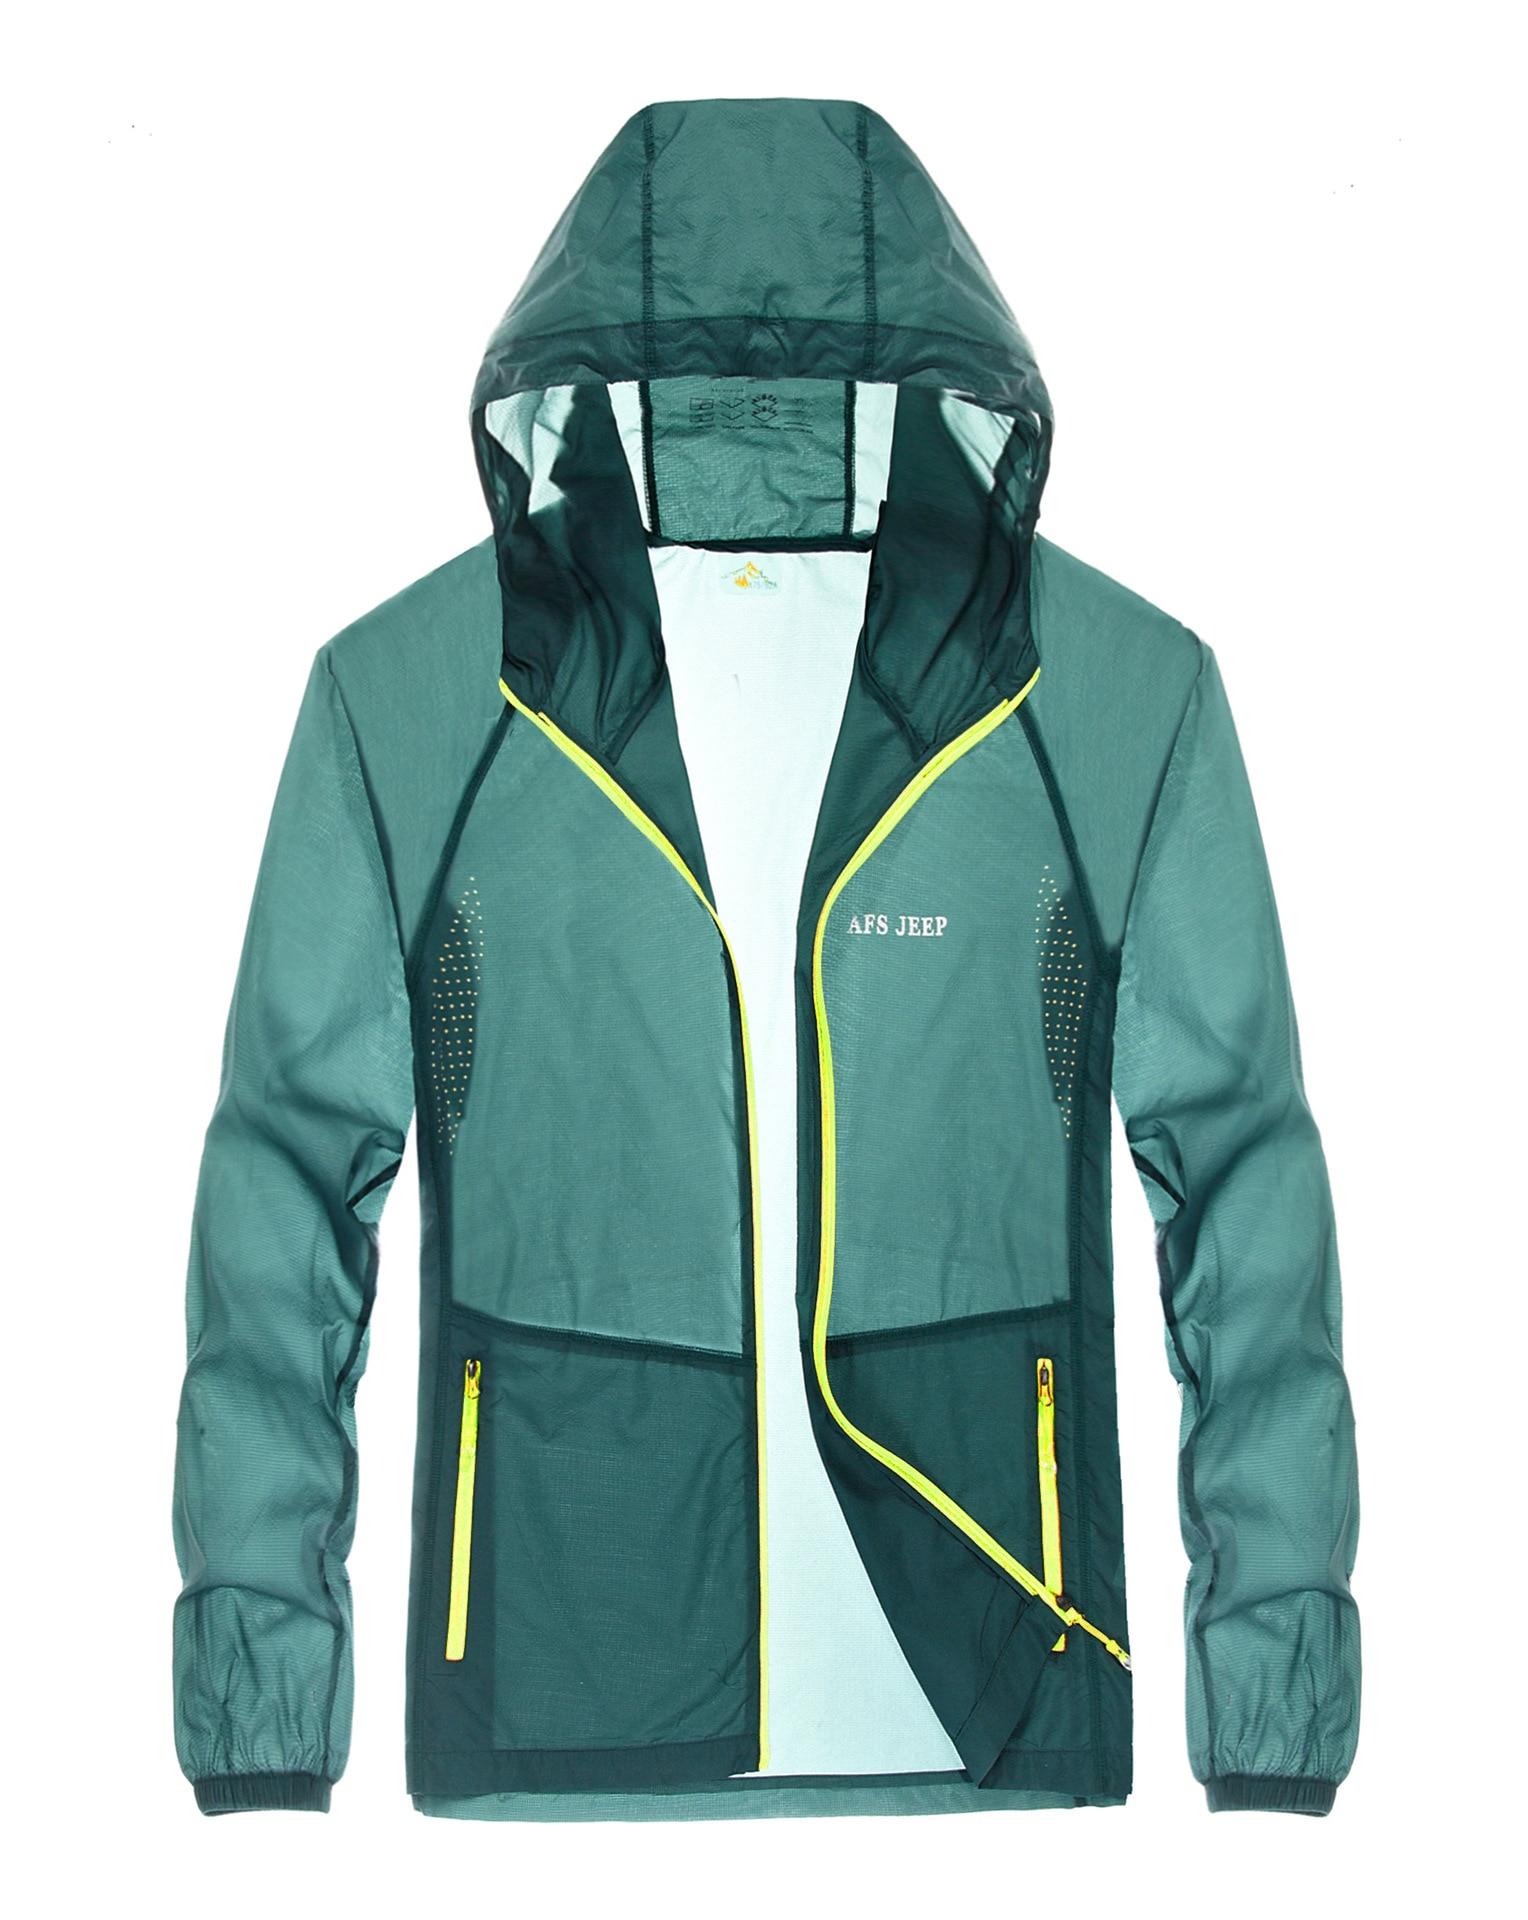 Personalized Windbreaker Jackets | Jackets Review